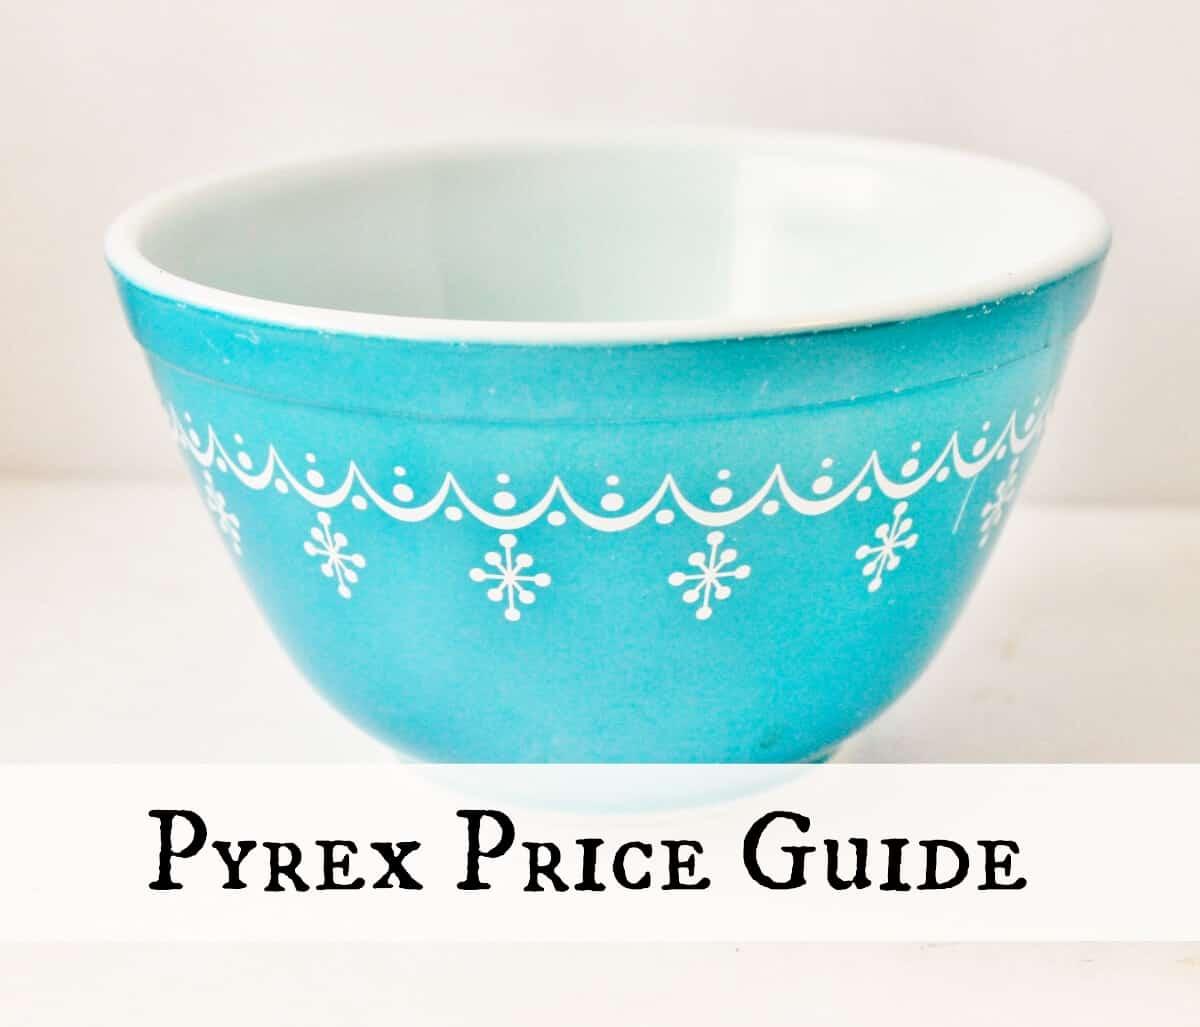 Vintage Pyrex Price Guide • Adirondack Girl @ Heart